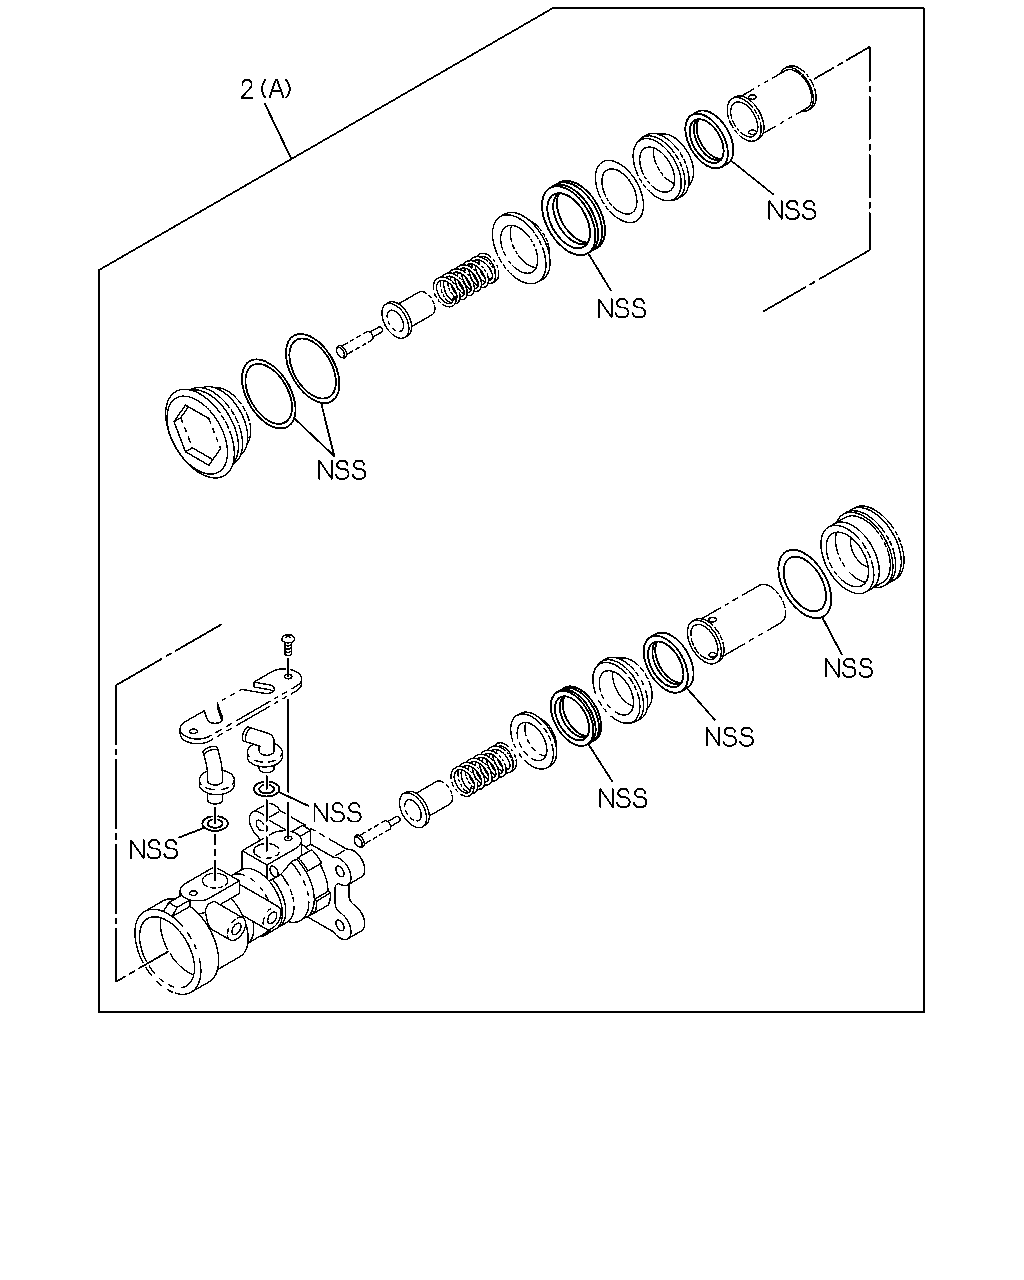 N, 50815 - NPR/NQR-LHD 99 - 02, 3 - Brakes, Brake System, 3-30